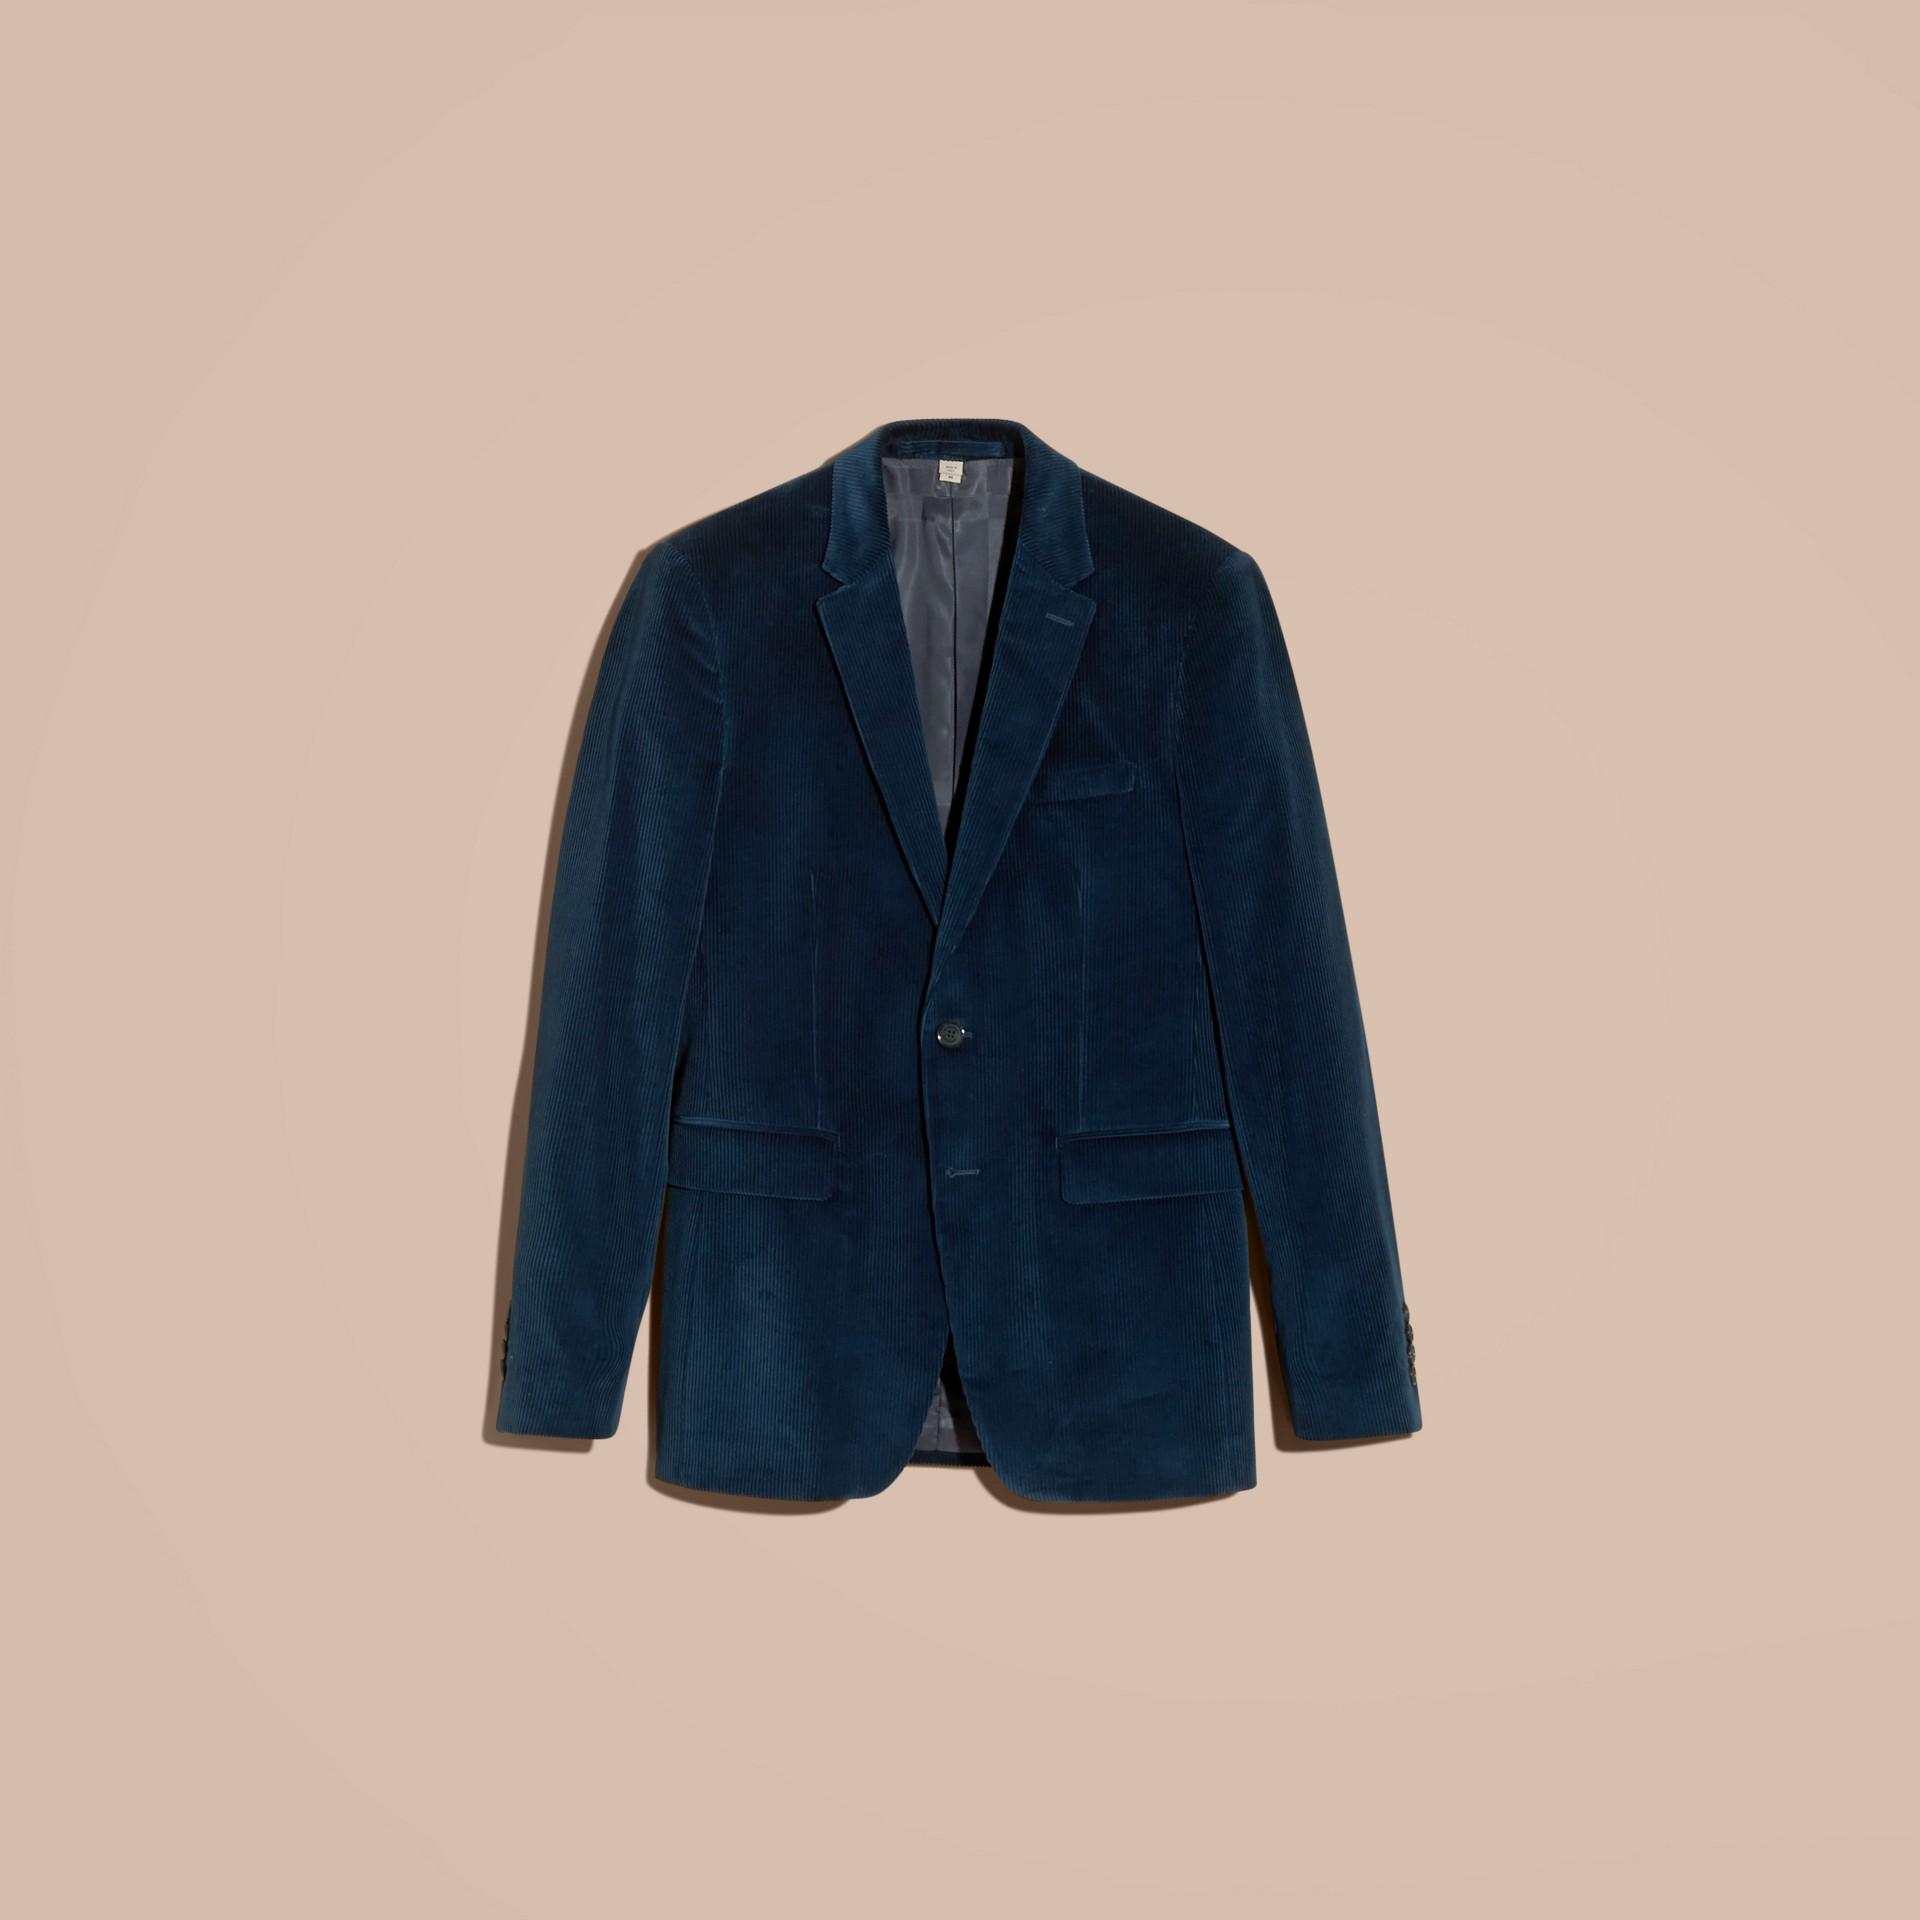 Navy Slim Fit Cotton Corduroy Jacket - gallery image 4